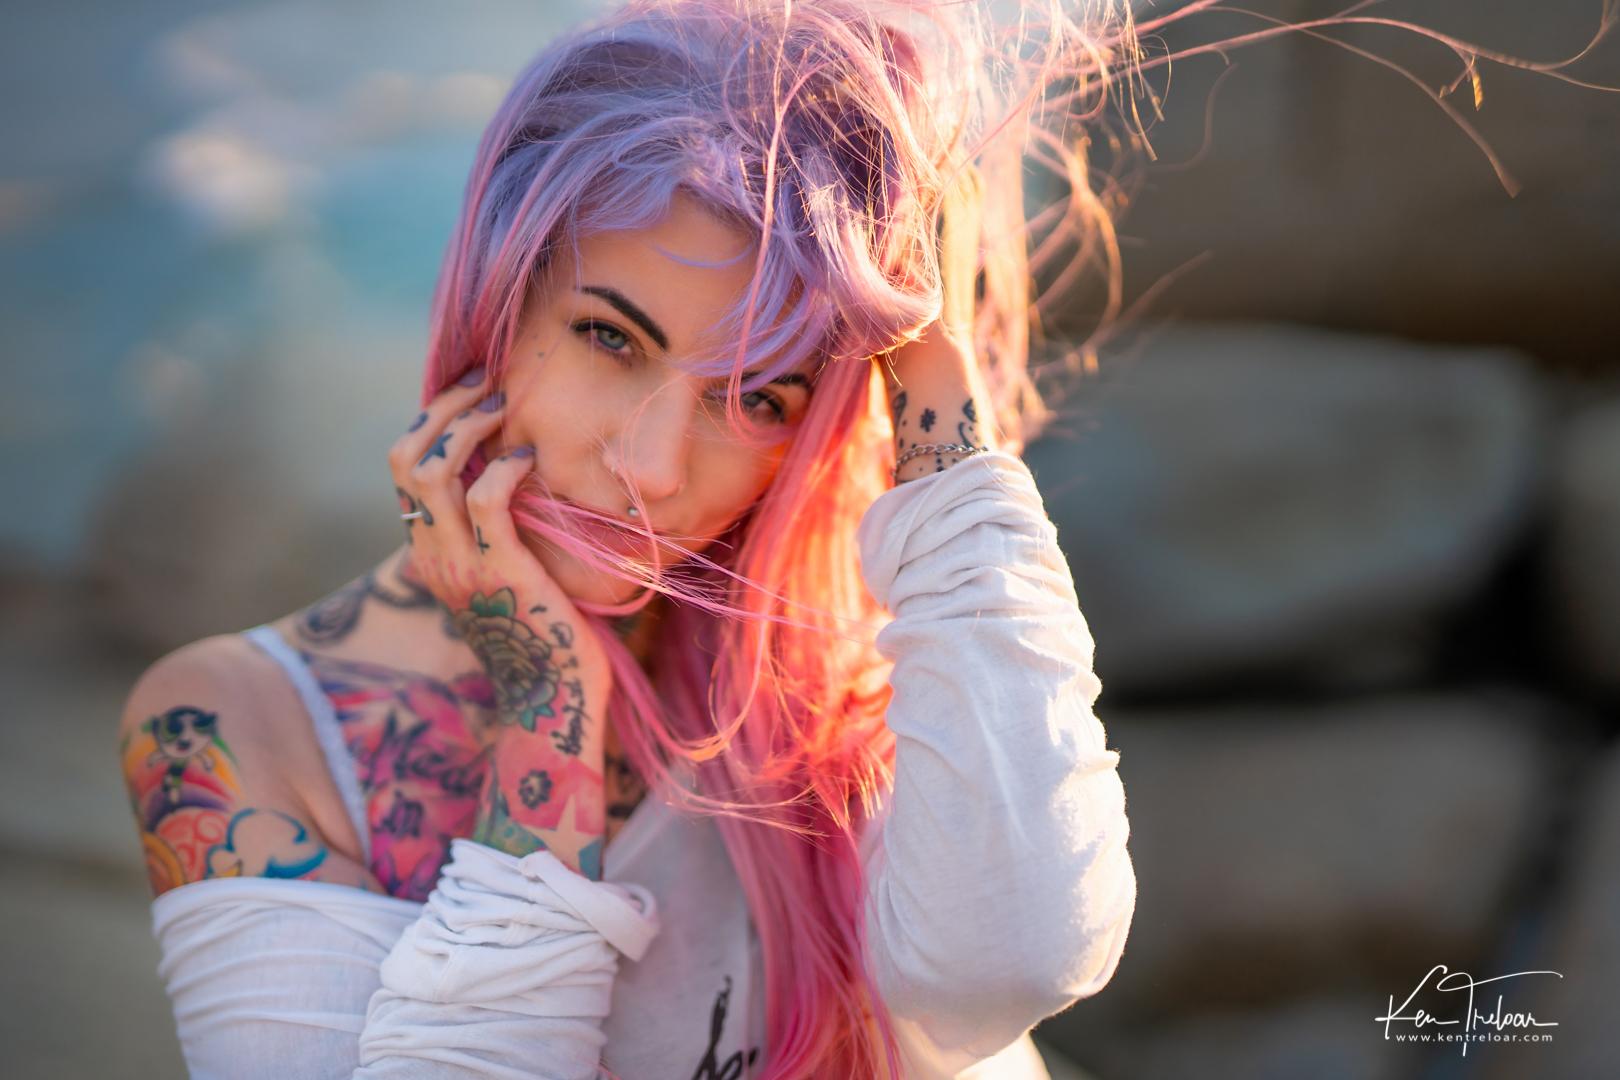 2_Christine Van Ink - Kief Modils - Cape Town LLandudno - Portrait session - by Ken Treloar Photography-Sml-3.jpg